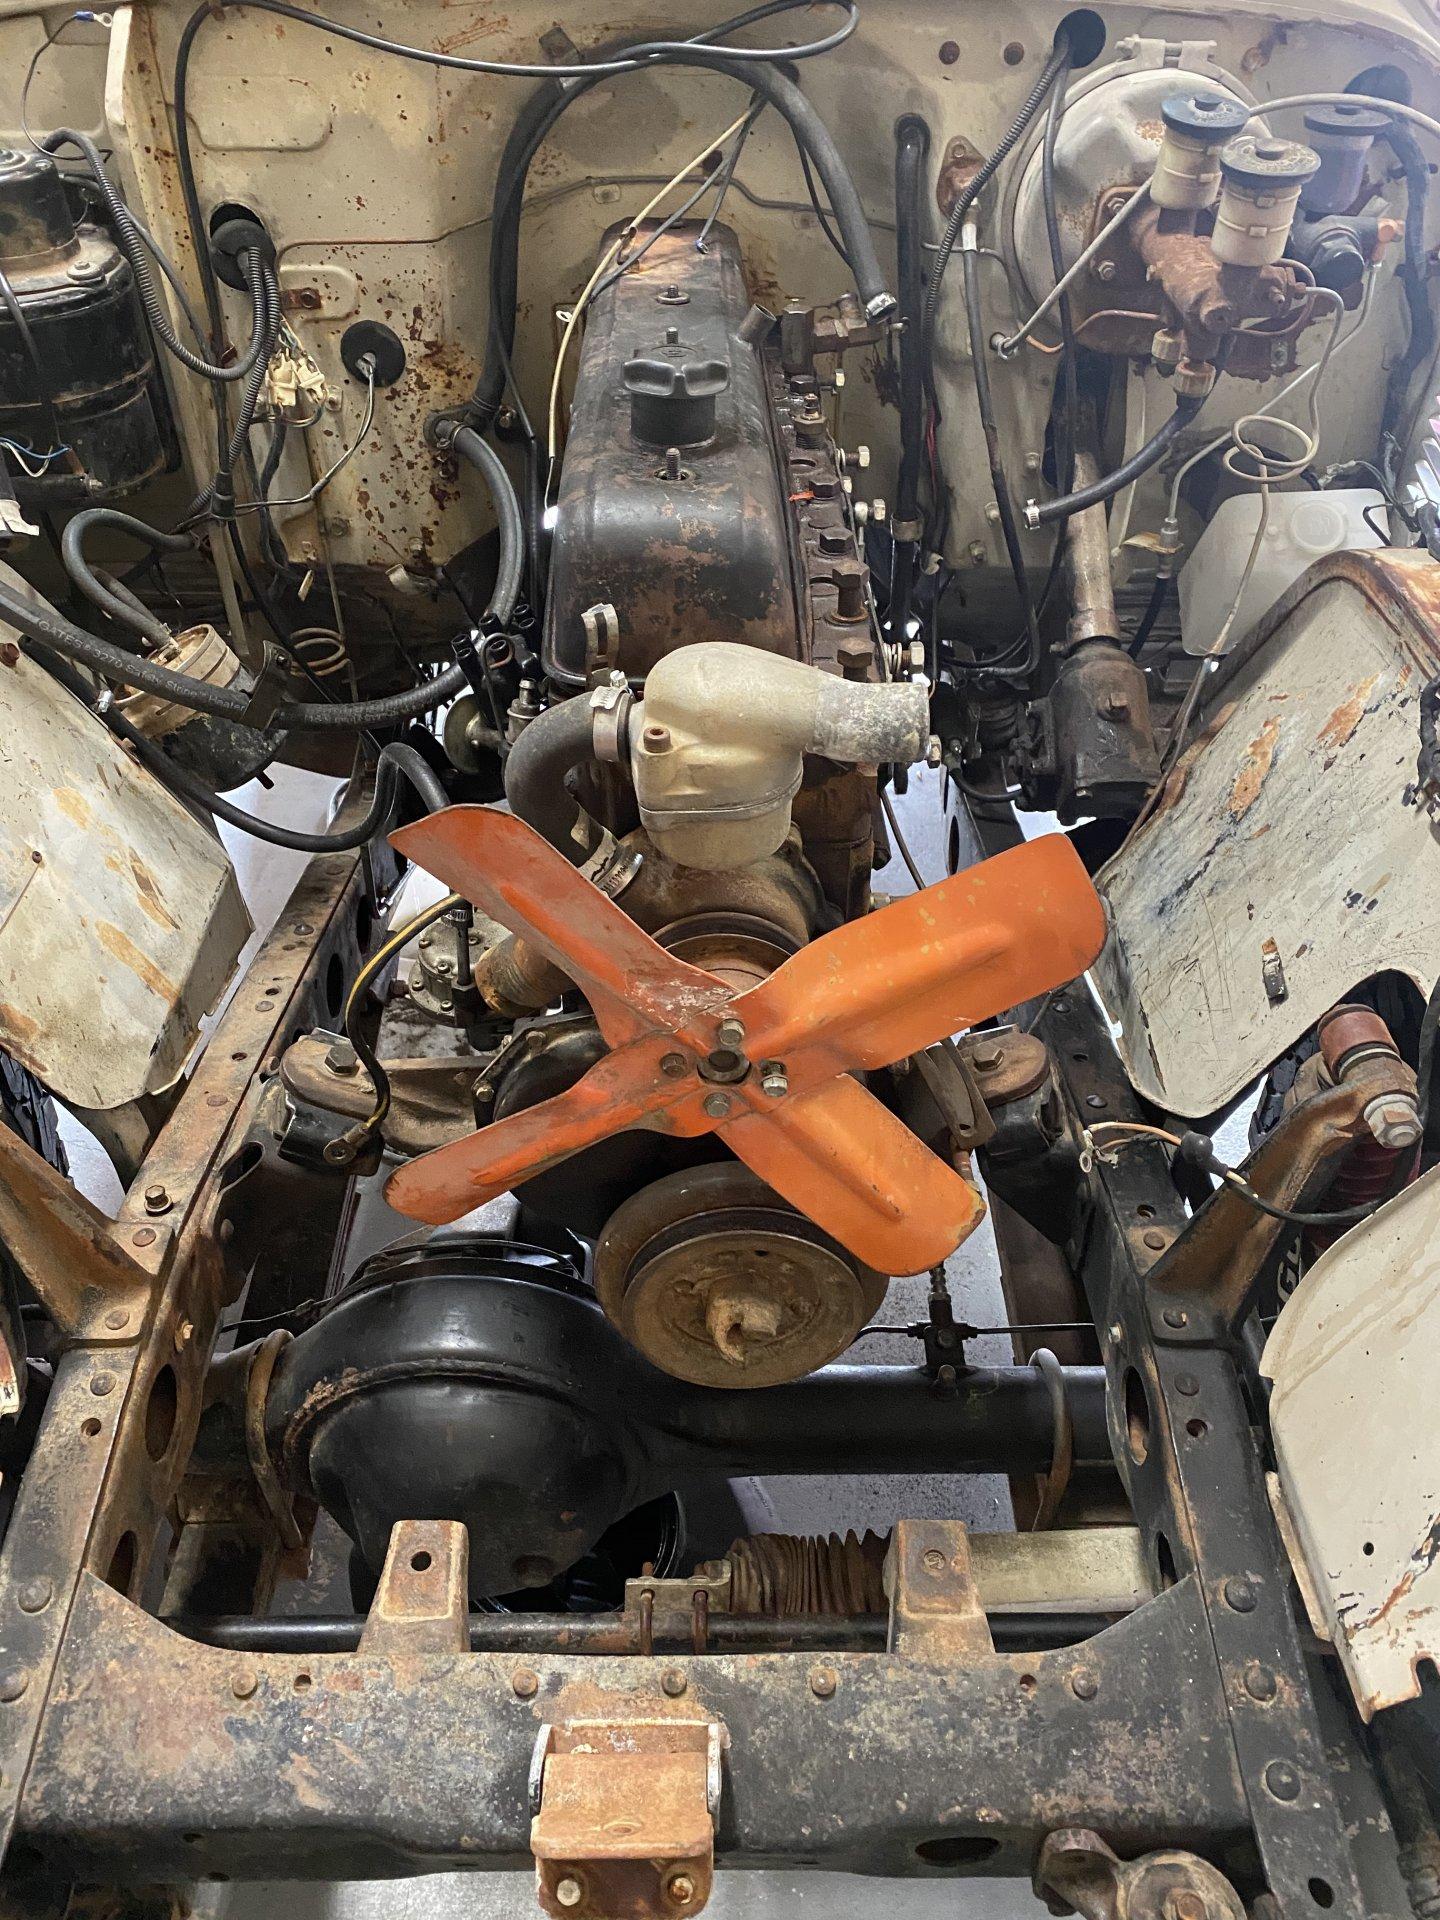 Stripped engine.jpg